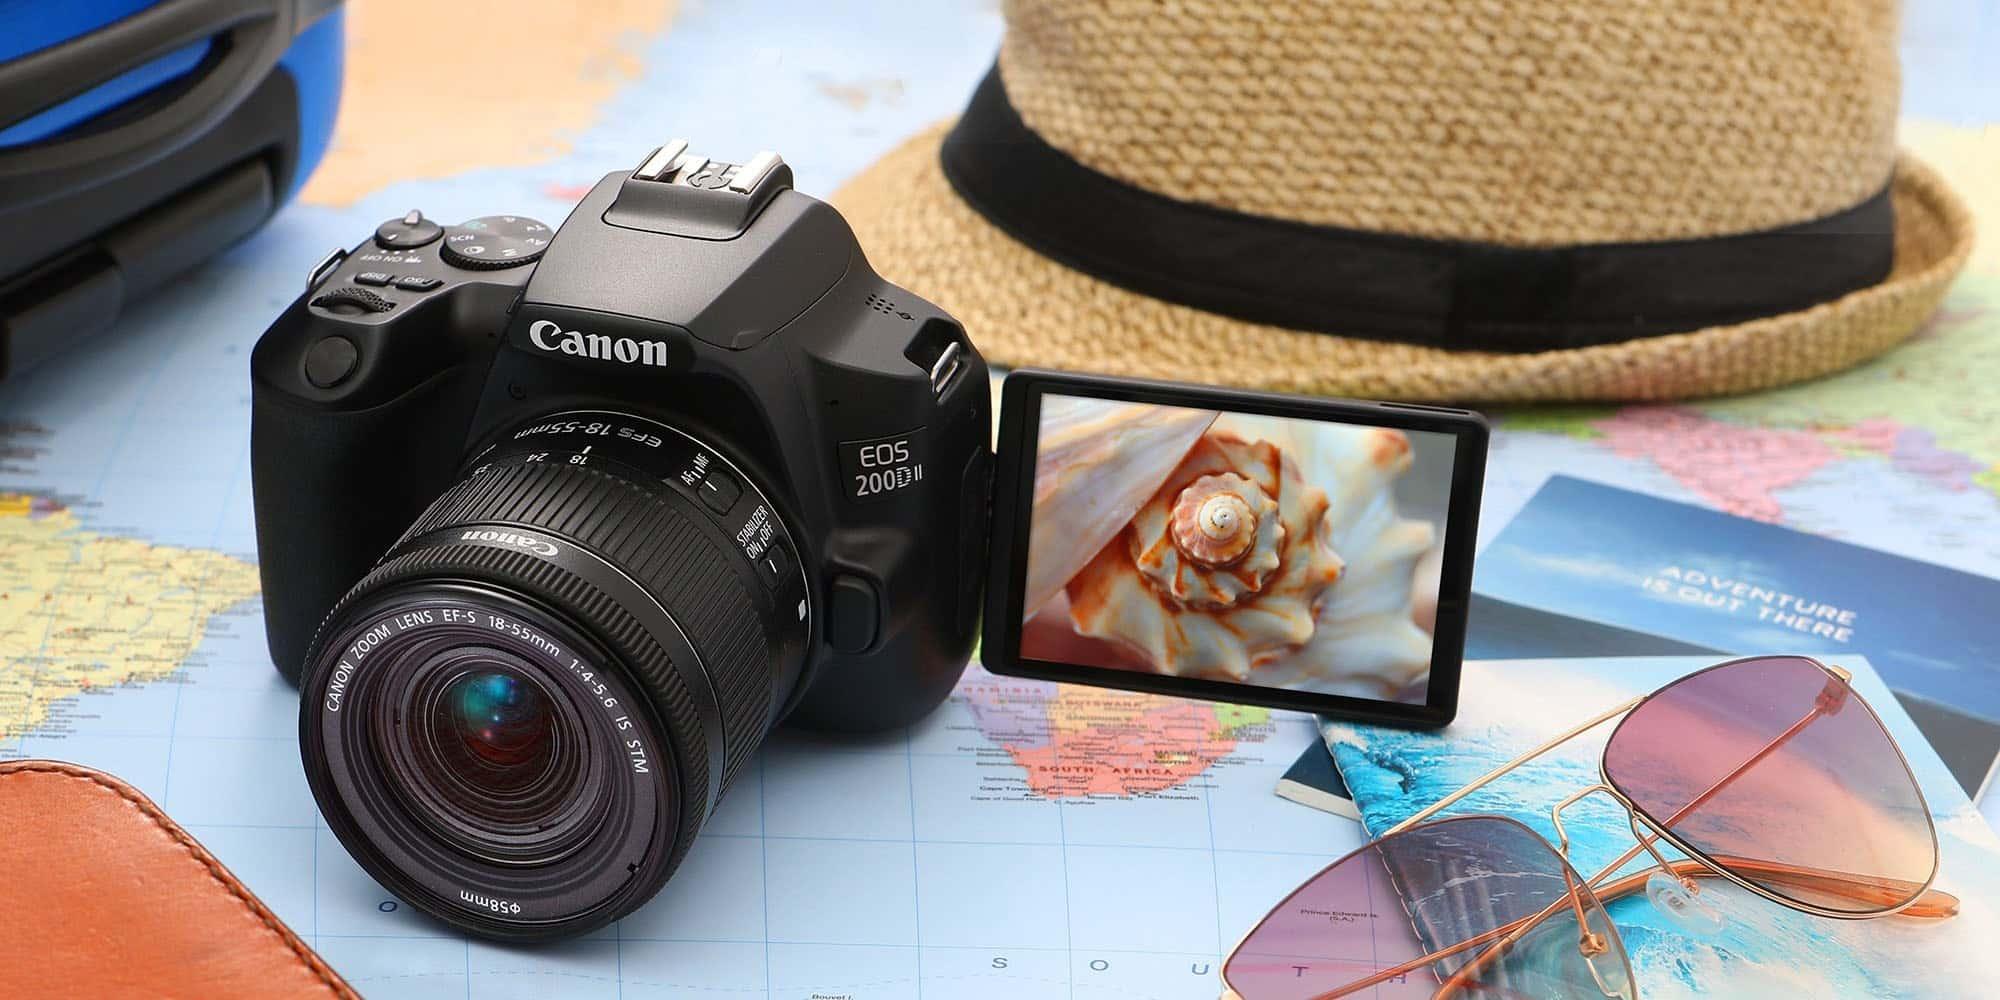 goedkope canon eos 200d spiegelreflexcamera